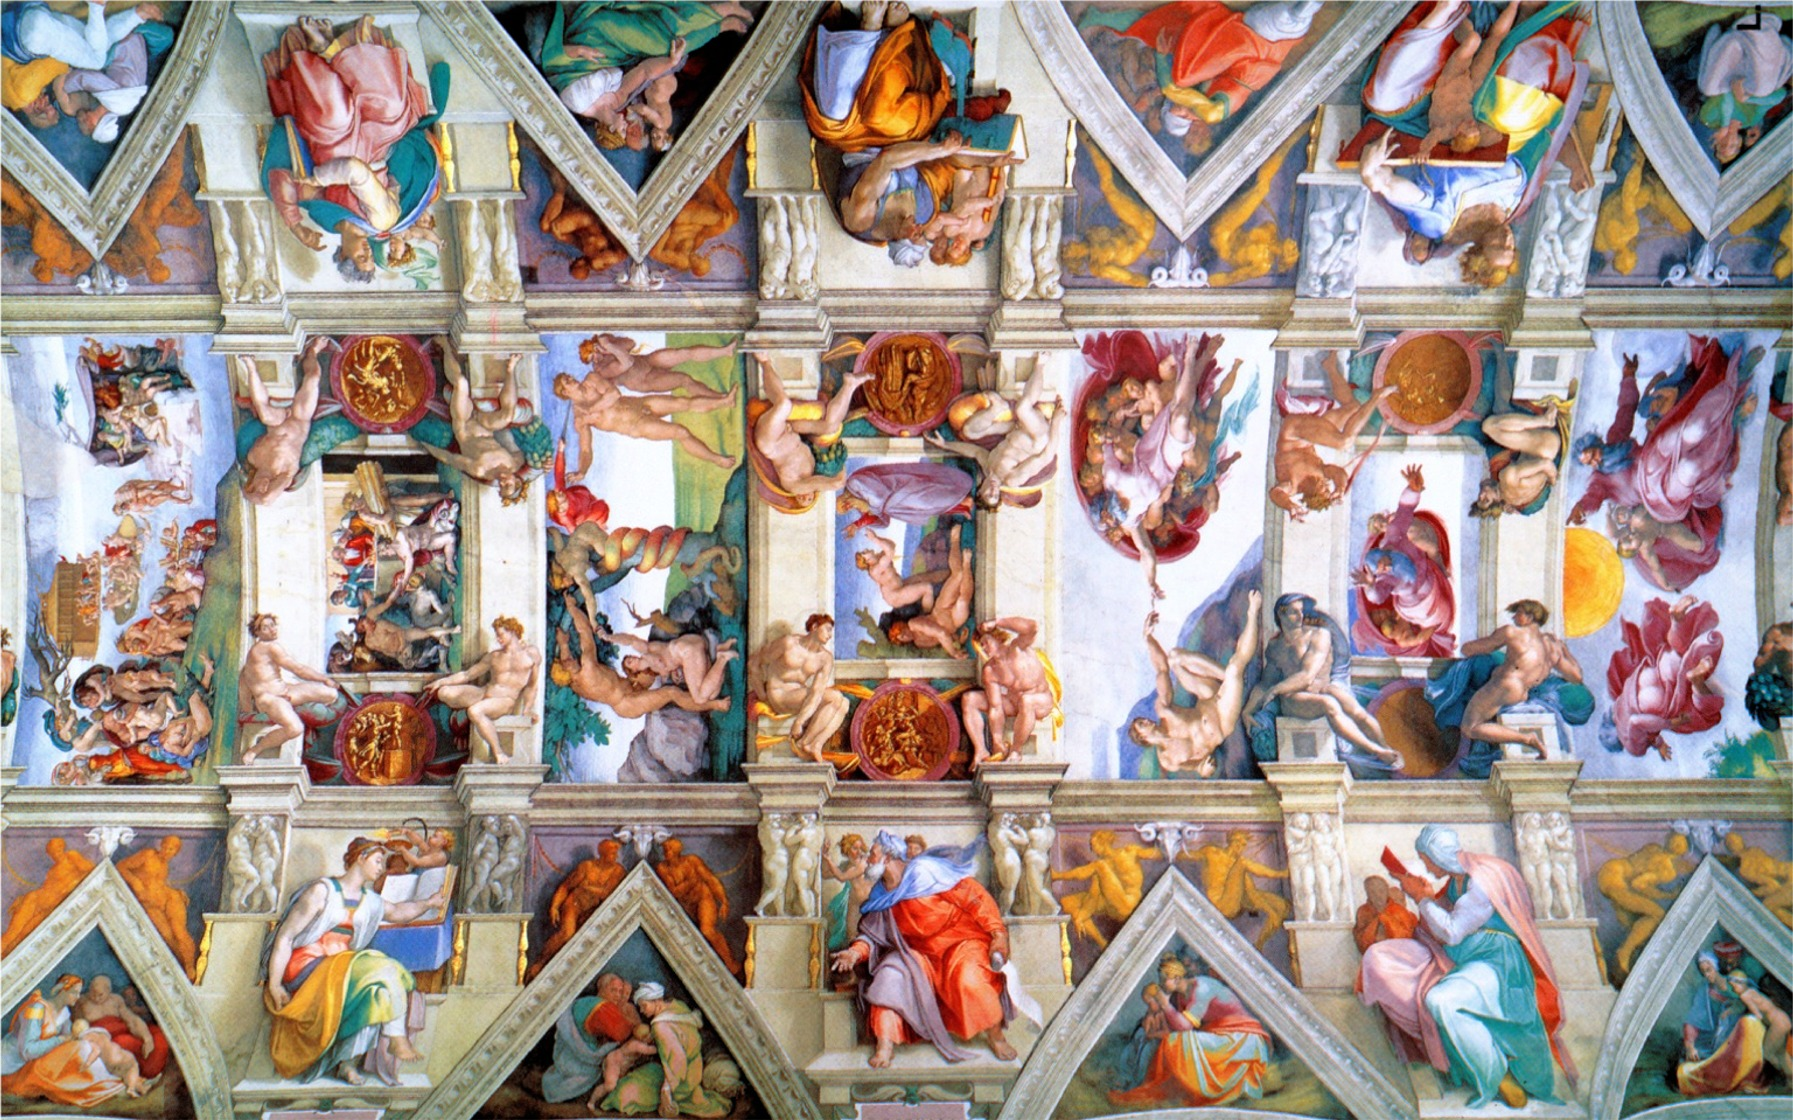 Download Pin Sistine Chapel Wallpaper Fever [1793x1120] 47 1793x1120